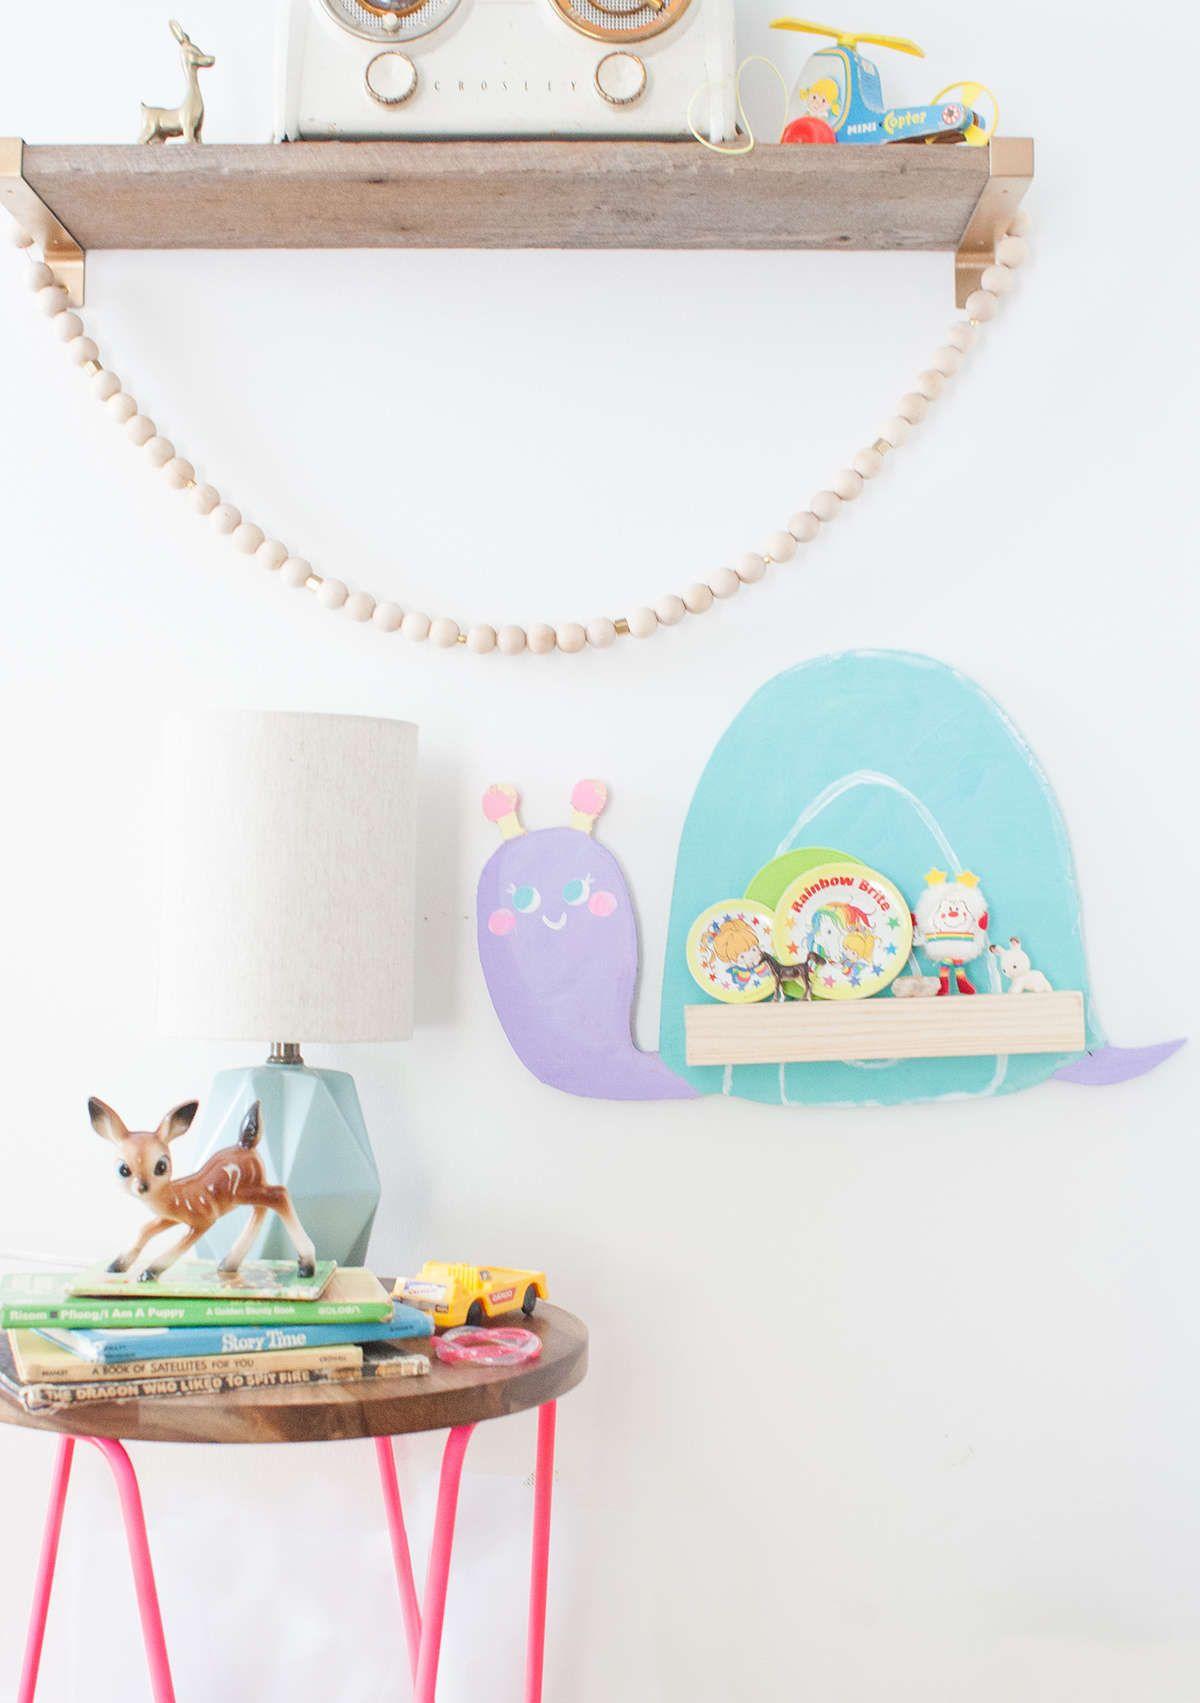 Diy shelf project diy projects shelves shelves diy